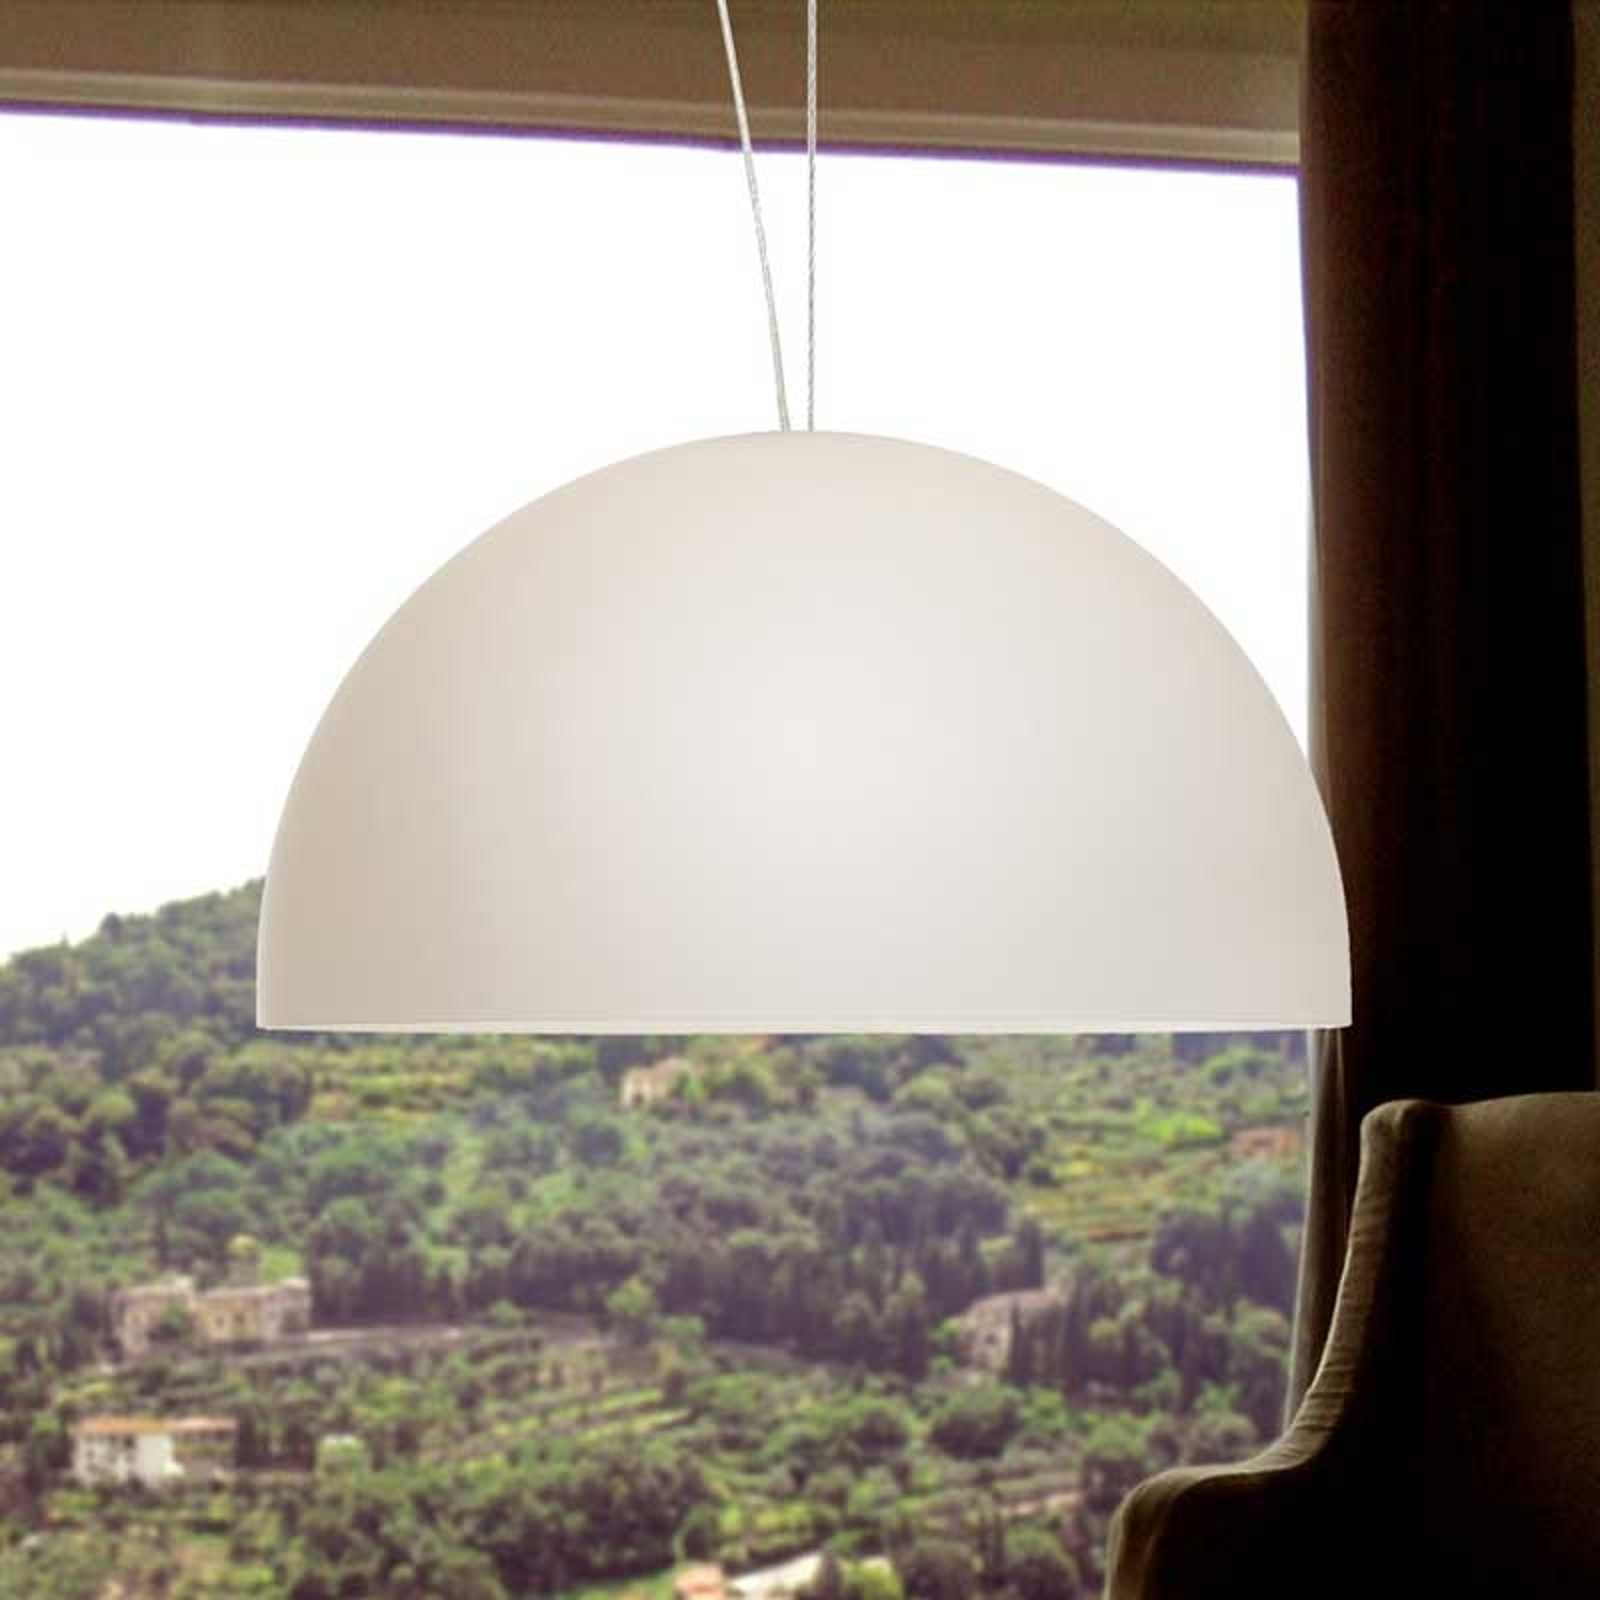 BOWL hanglamp, 1-lichts hanglamp, 26 cm